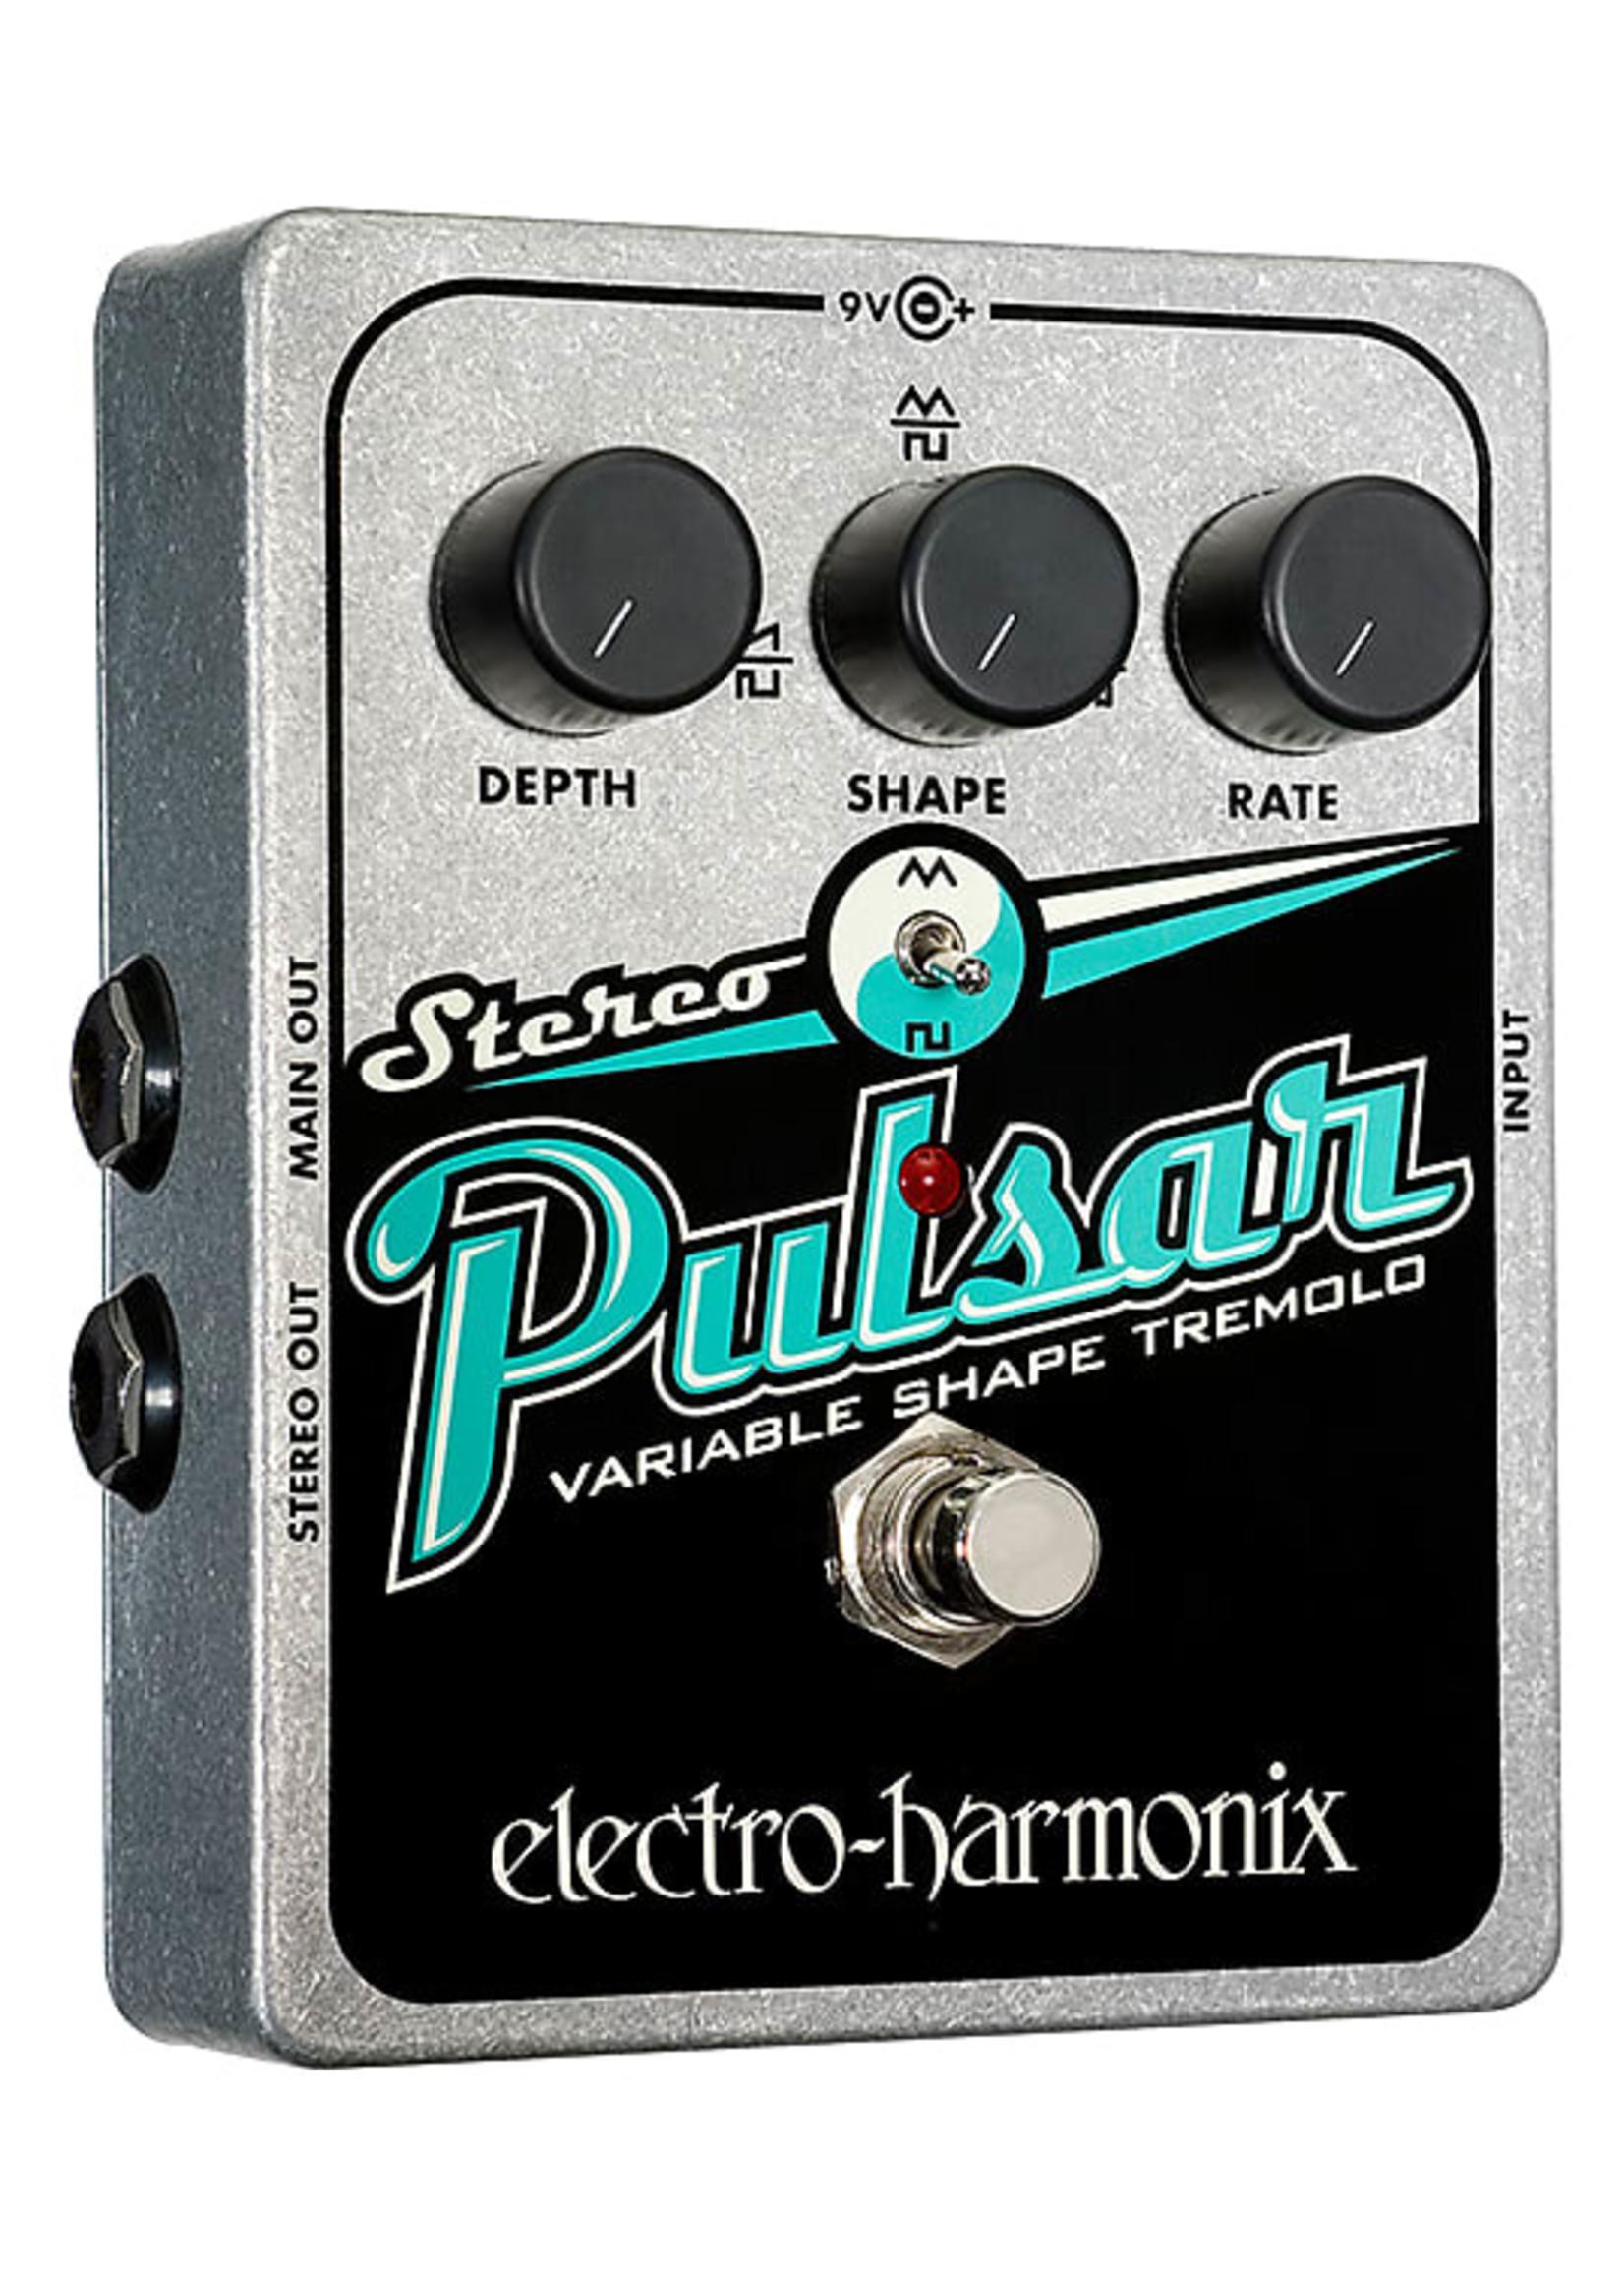 Electro-Harmonix Electro-Harmonix Stereo Pulsar Analog Tremolo